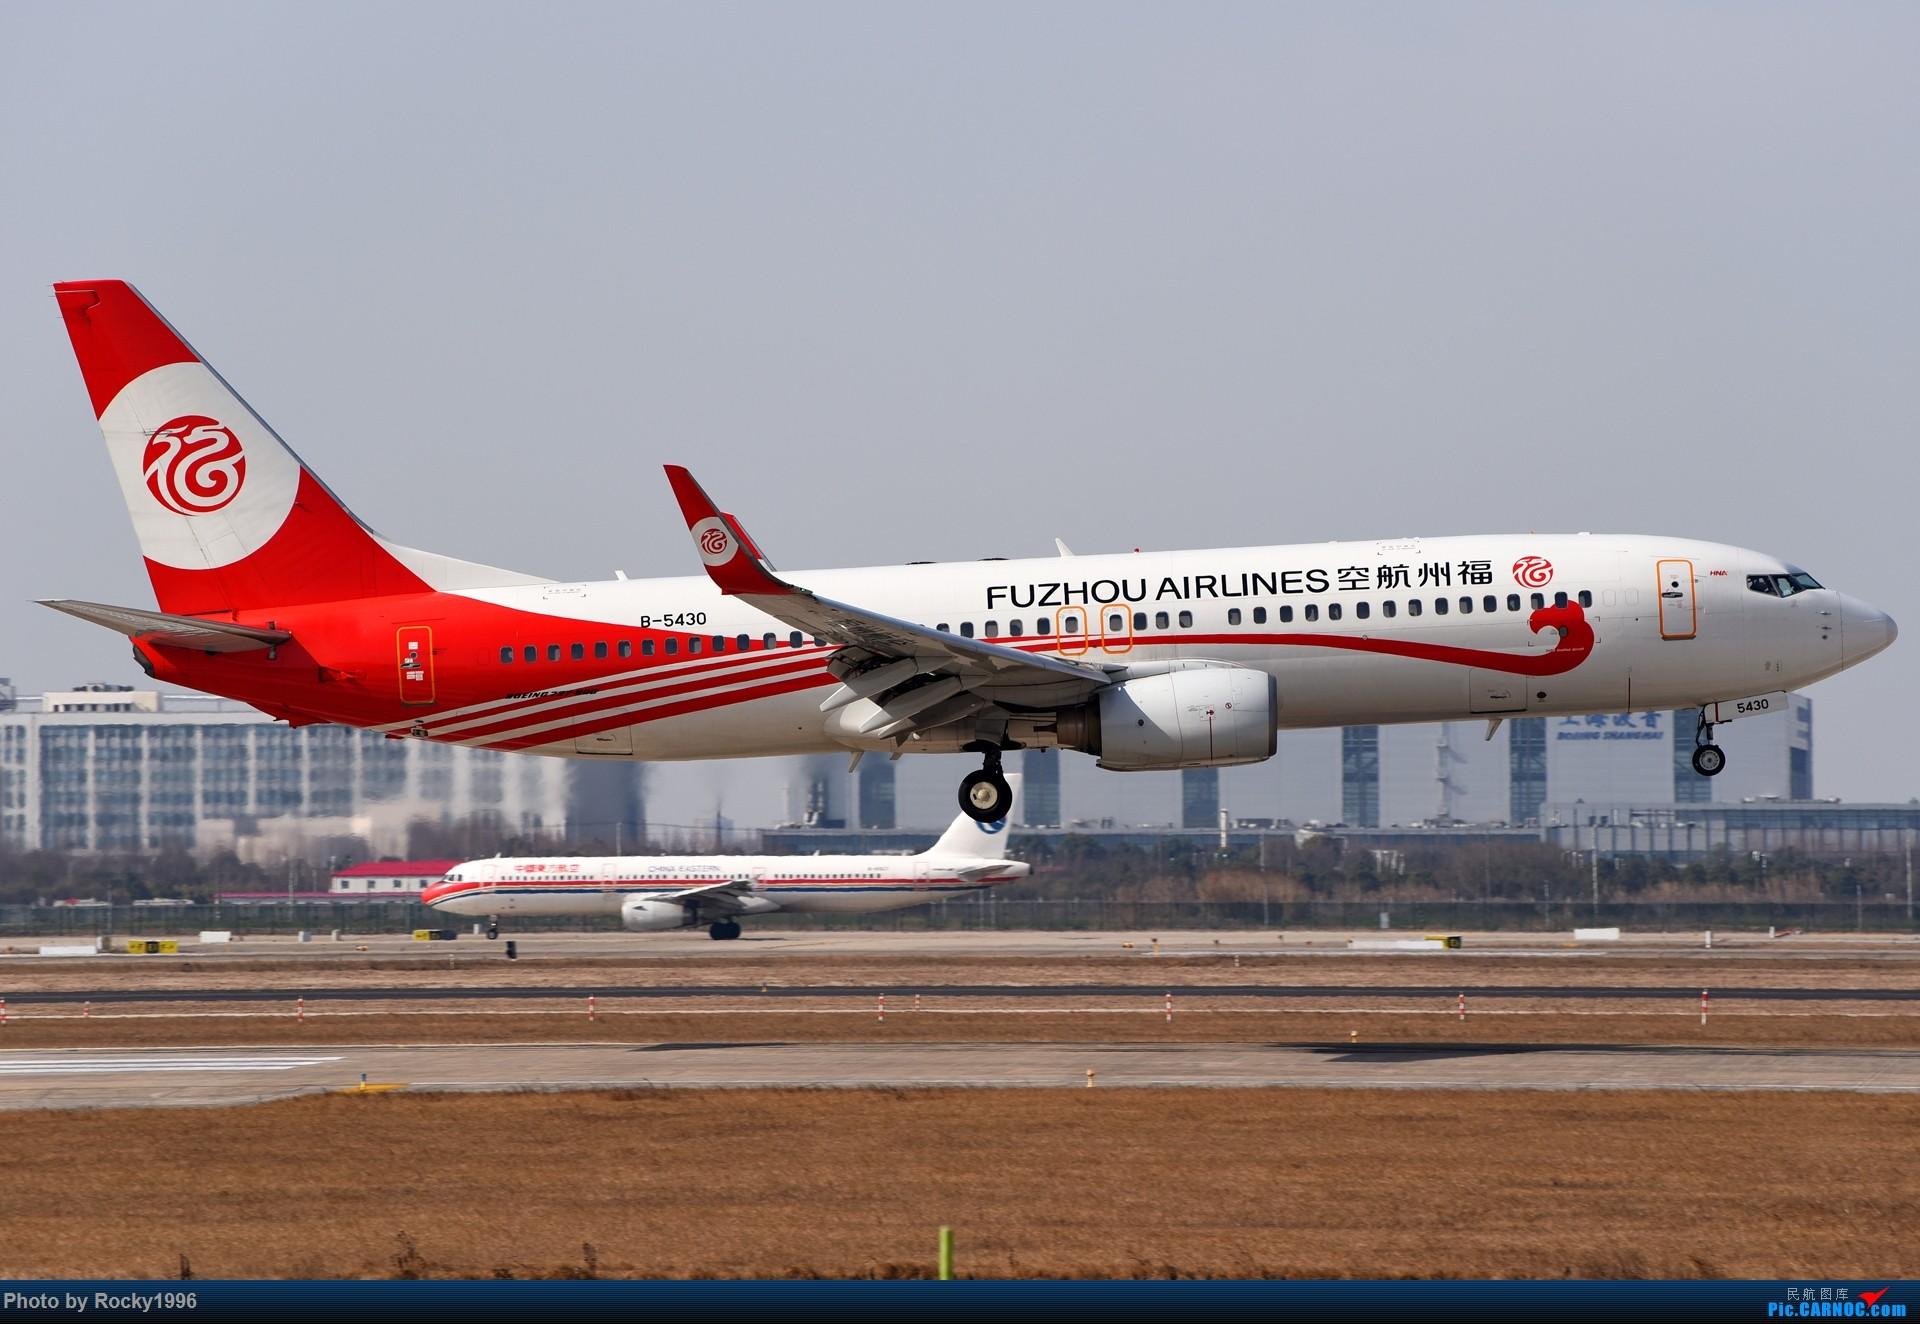 Re:[原创]要发霉了,炒个冷饭 BOEING 737-800 B-5430 中国上海浦东国际机场